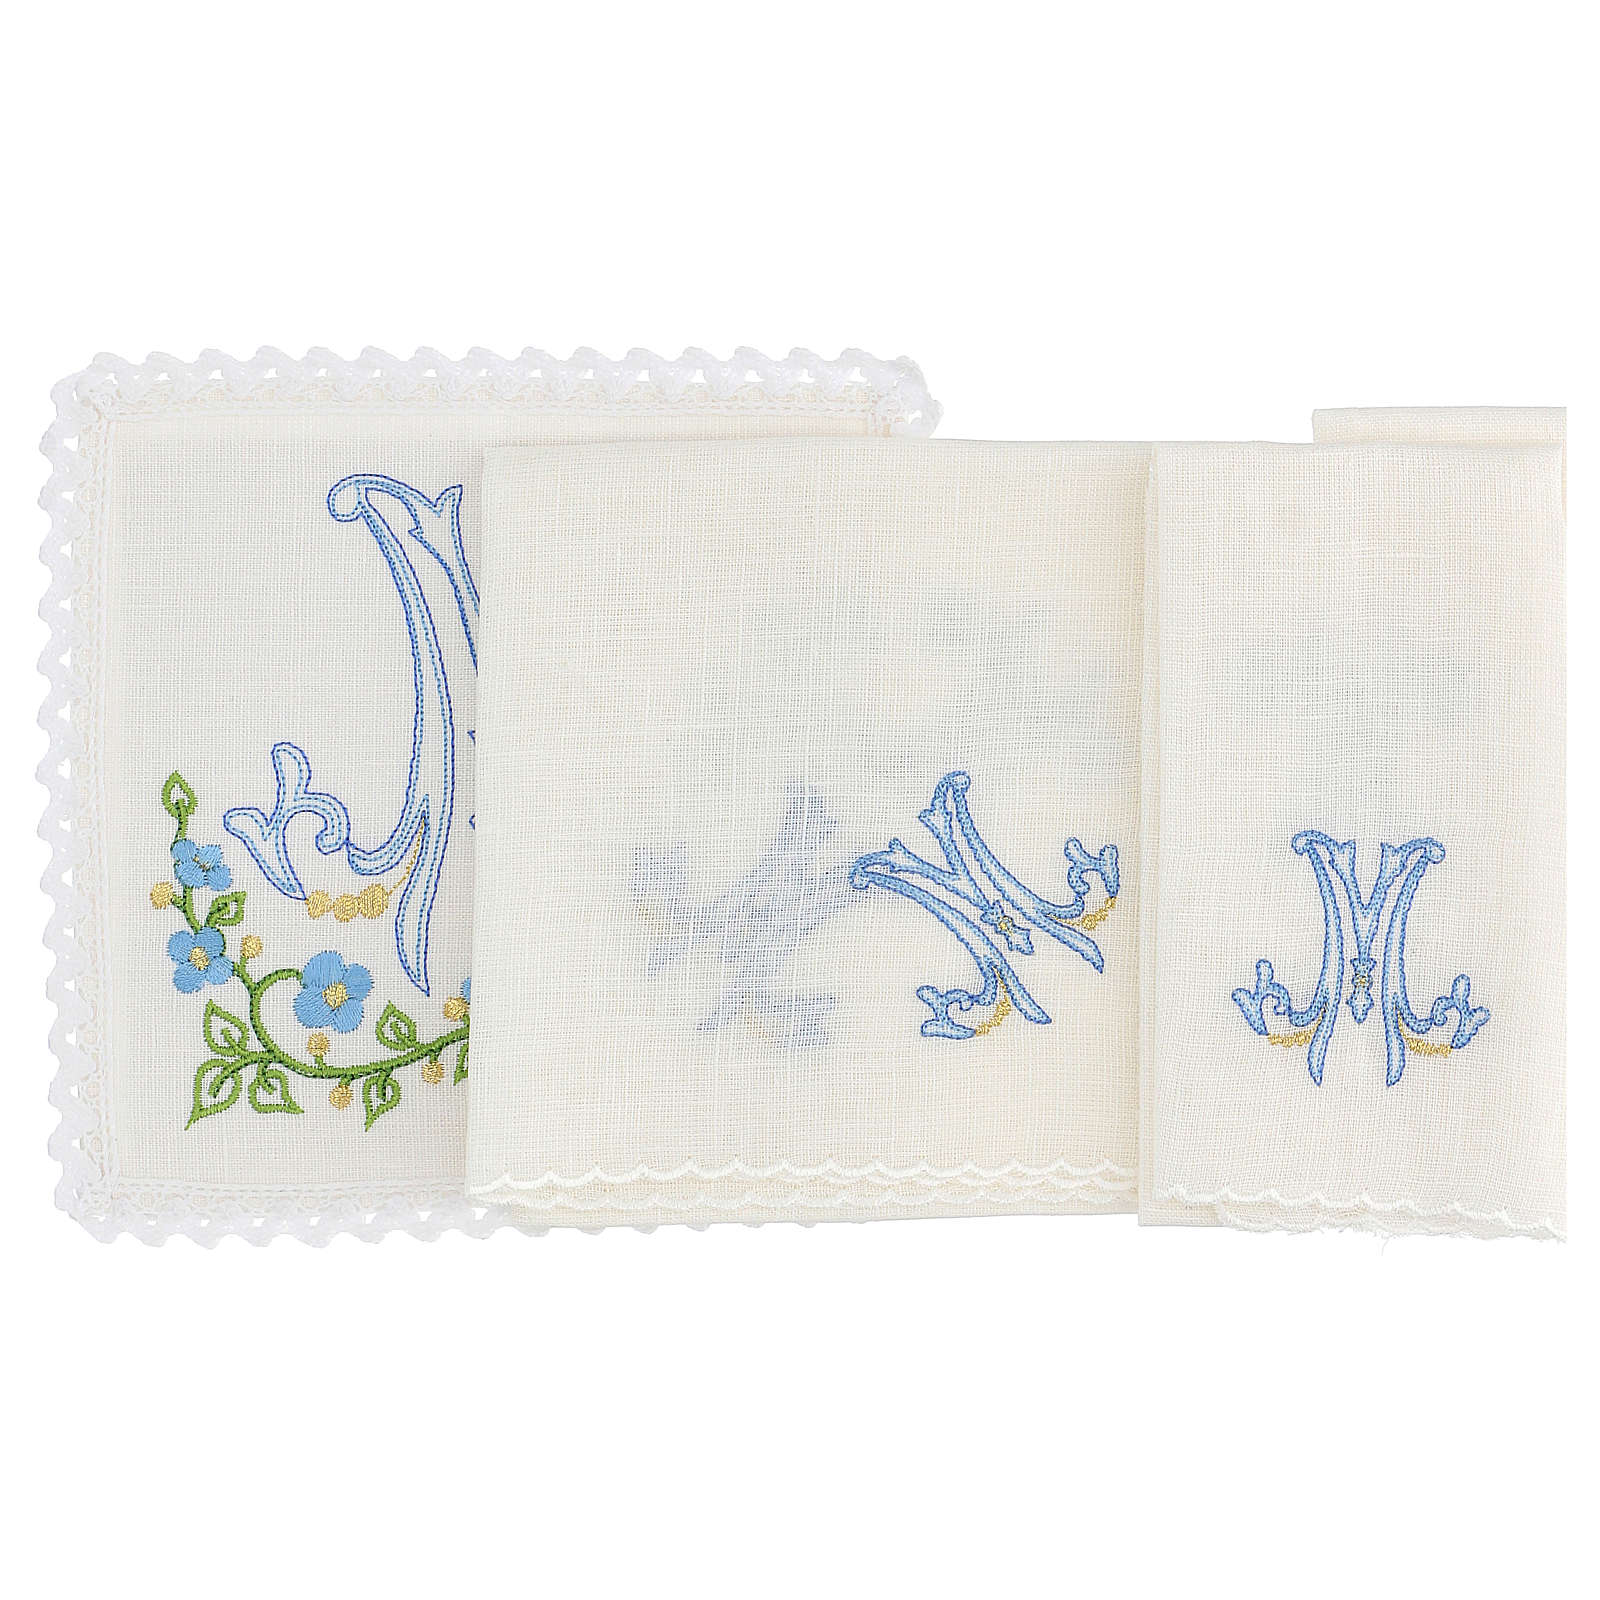 Altar linens set, with light blue Marian symbol 4